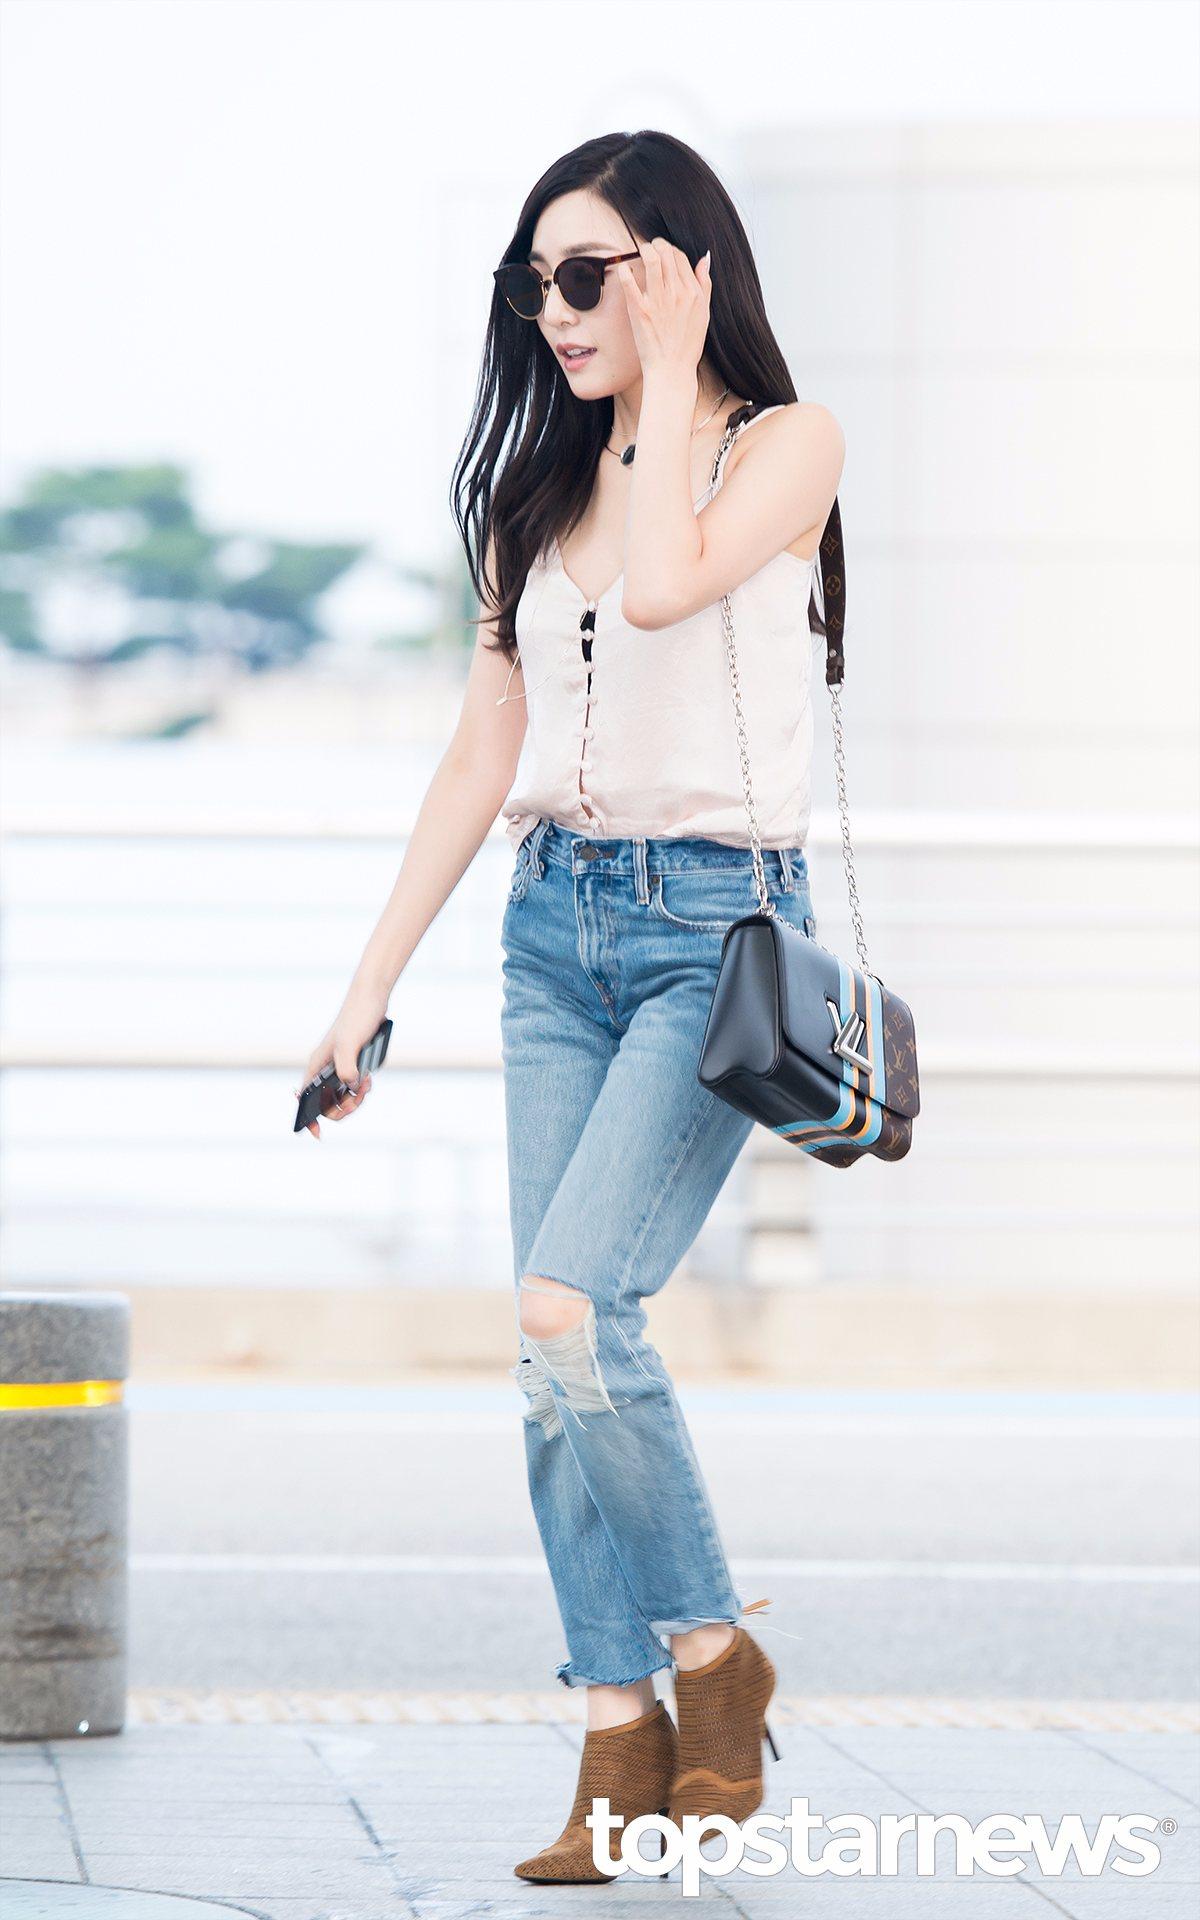 Tiffany完全就是美國style啊~胸口開這麼低還外露黑色內衣~這麼性感空少受得了嗎(笑)